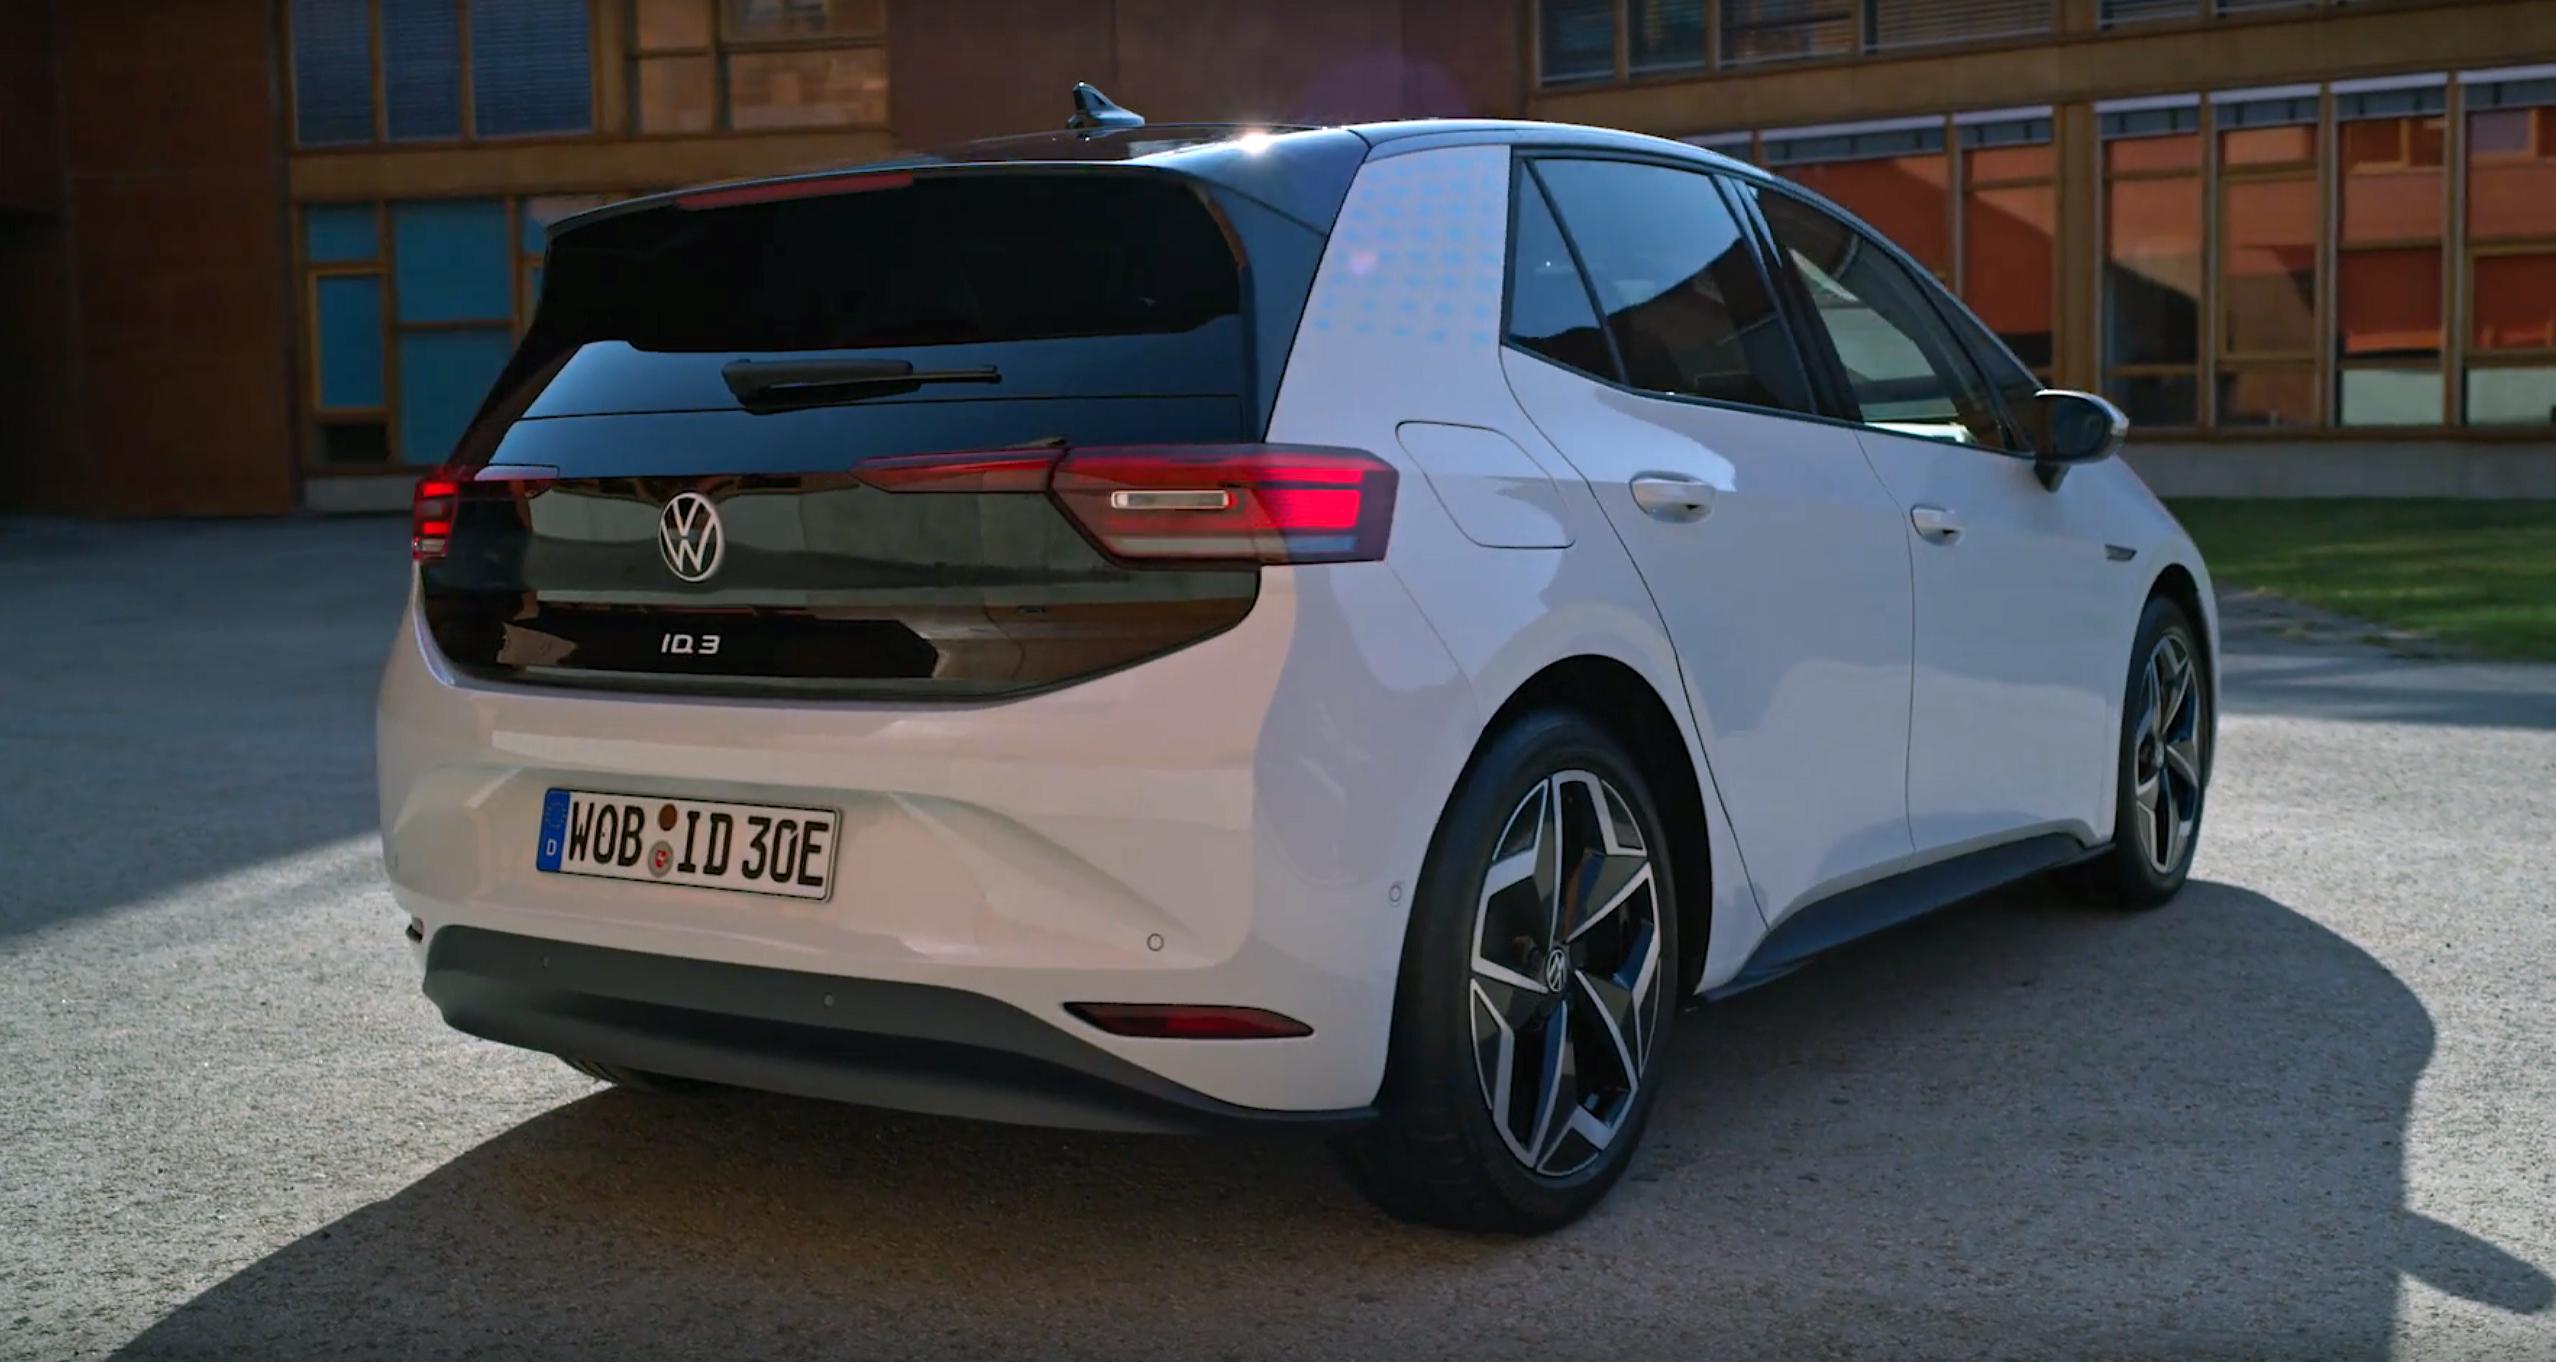 VW's ID.3